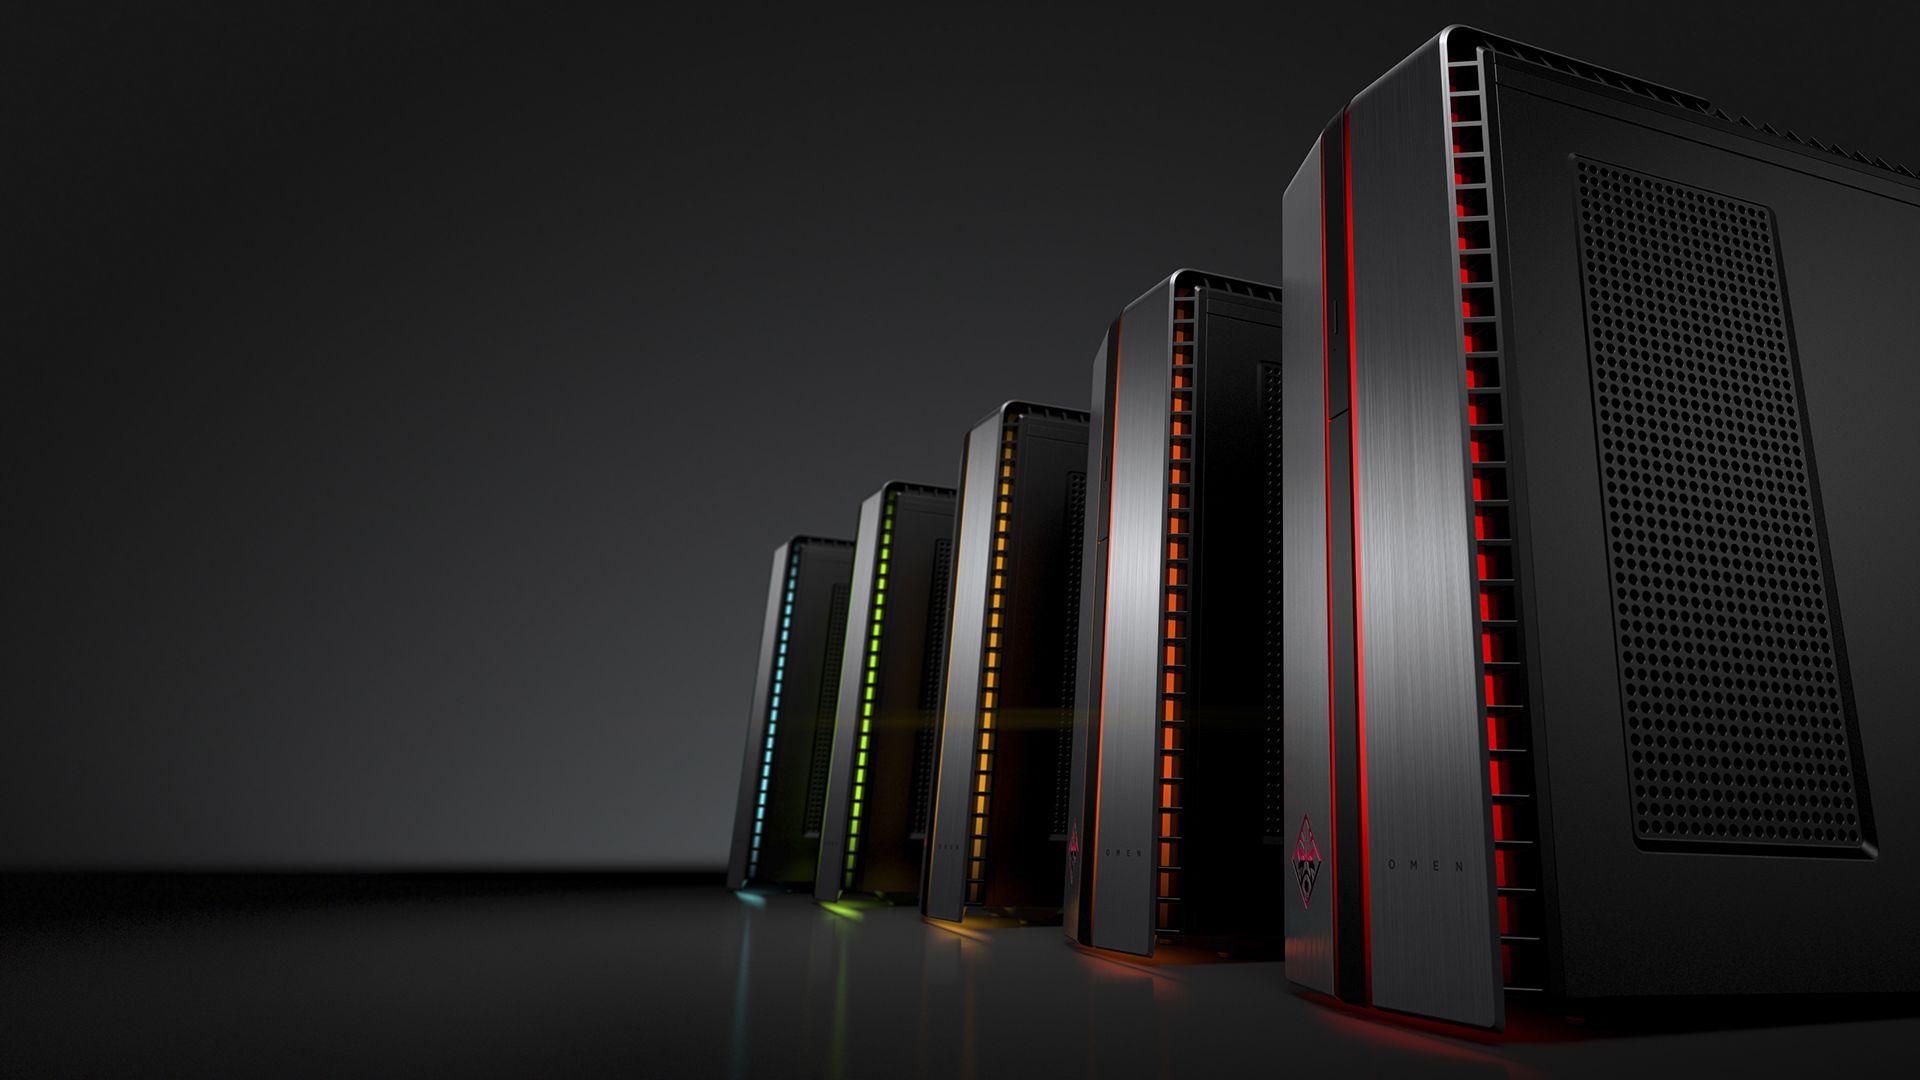 HP Omen Desktop gaming PC towers